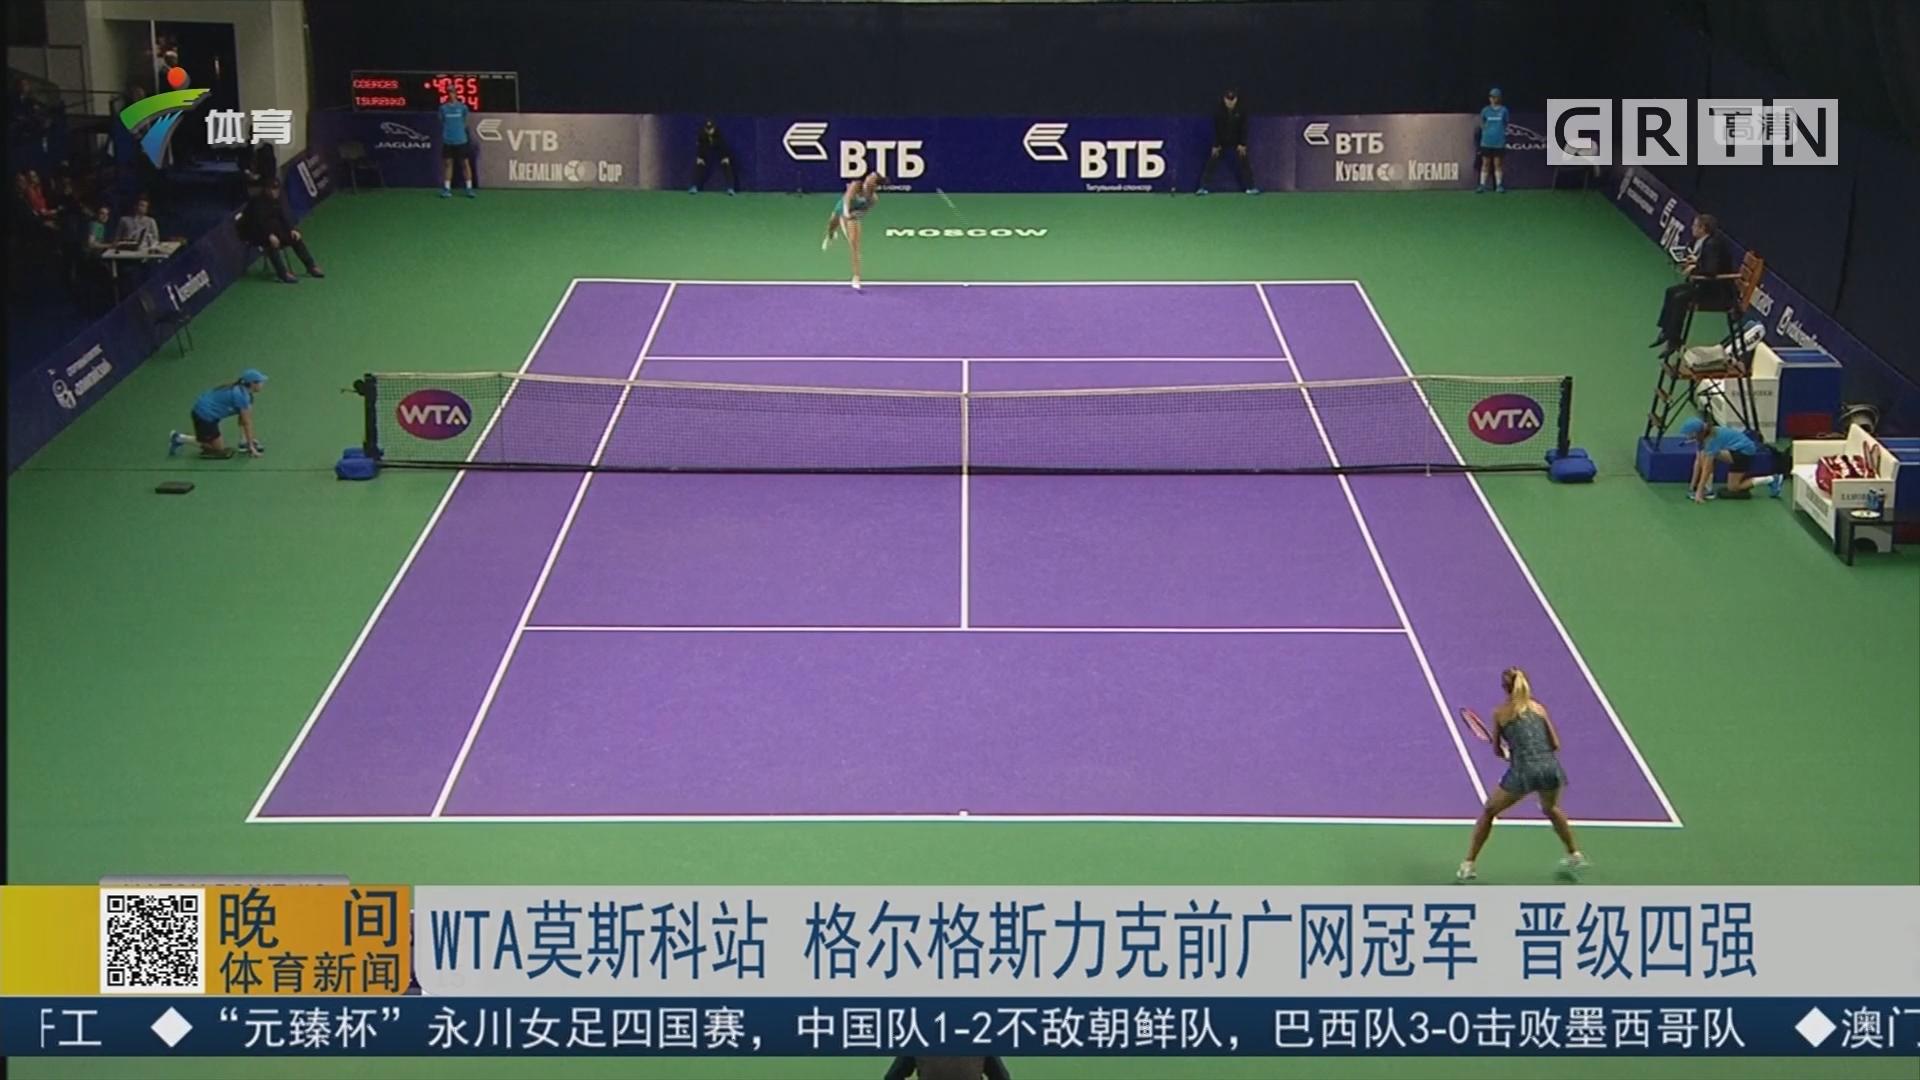 WTA莫斯科站 格尔格斯力克前广网冠军 晋级四强